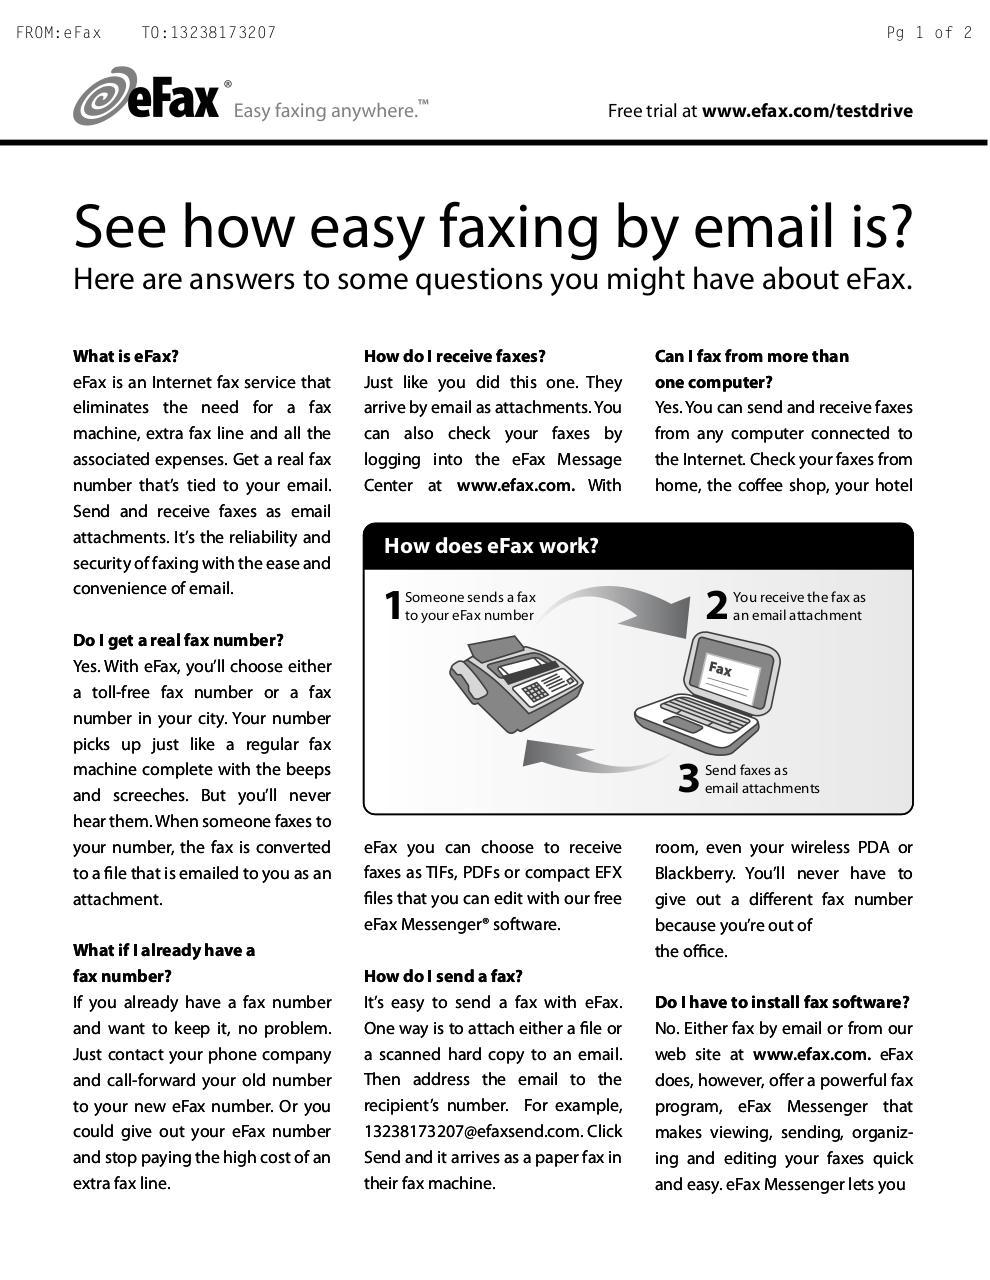 efax messenger software free download